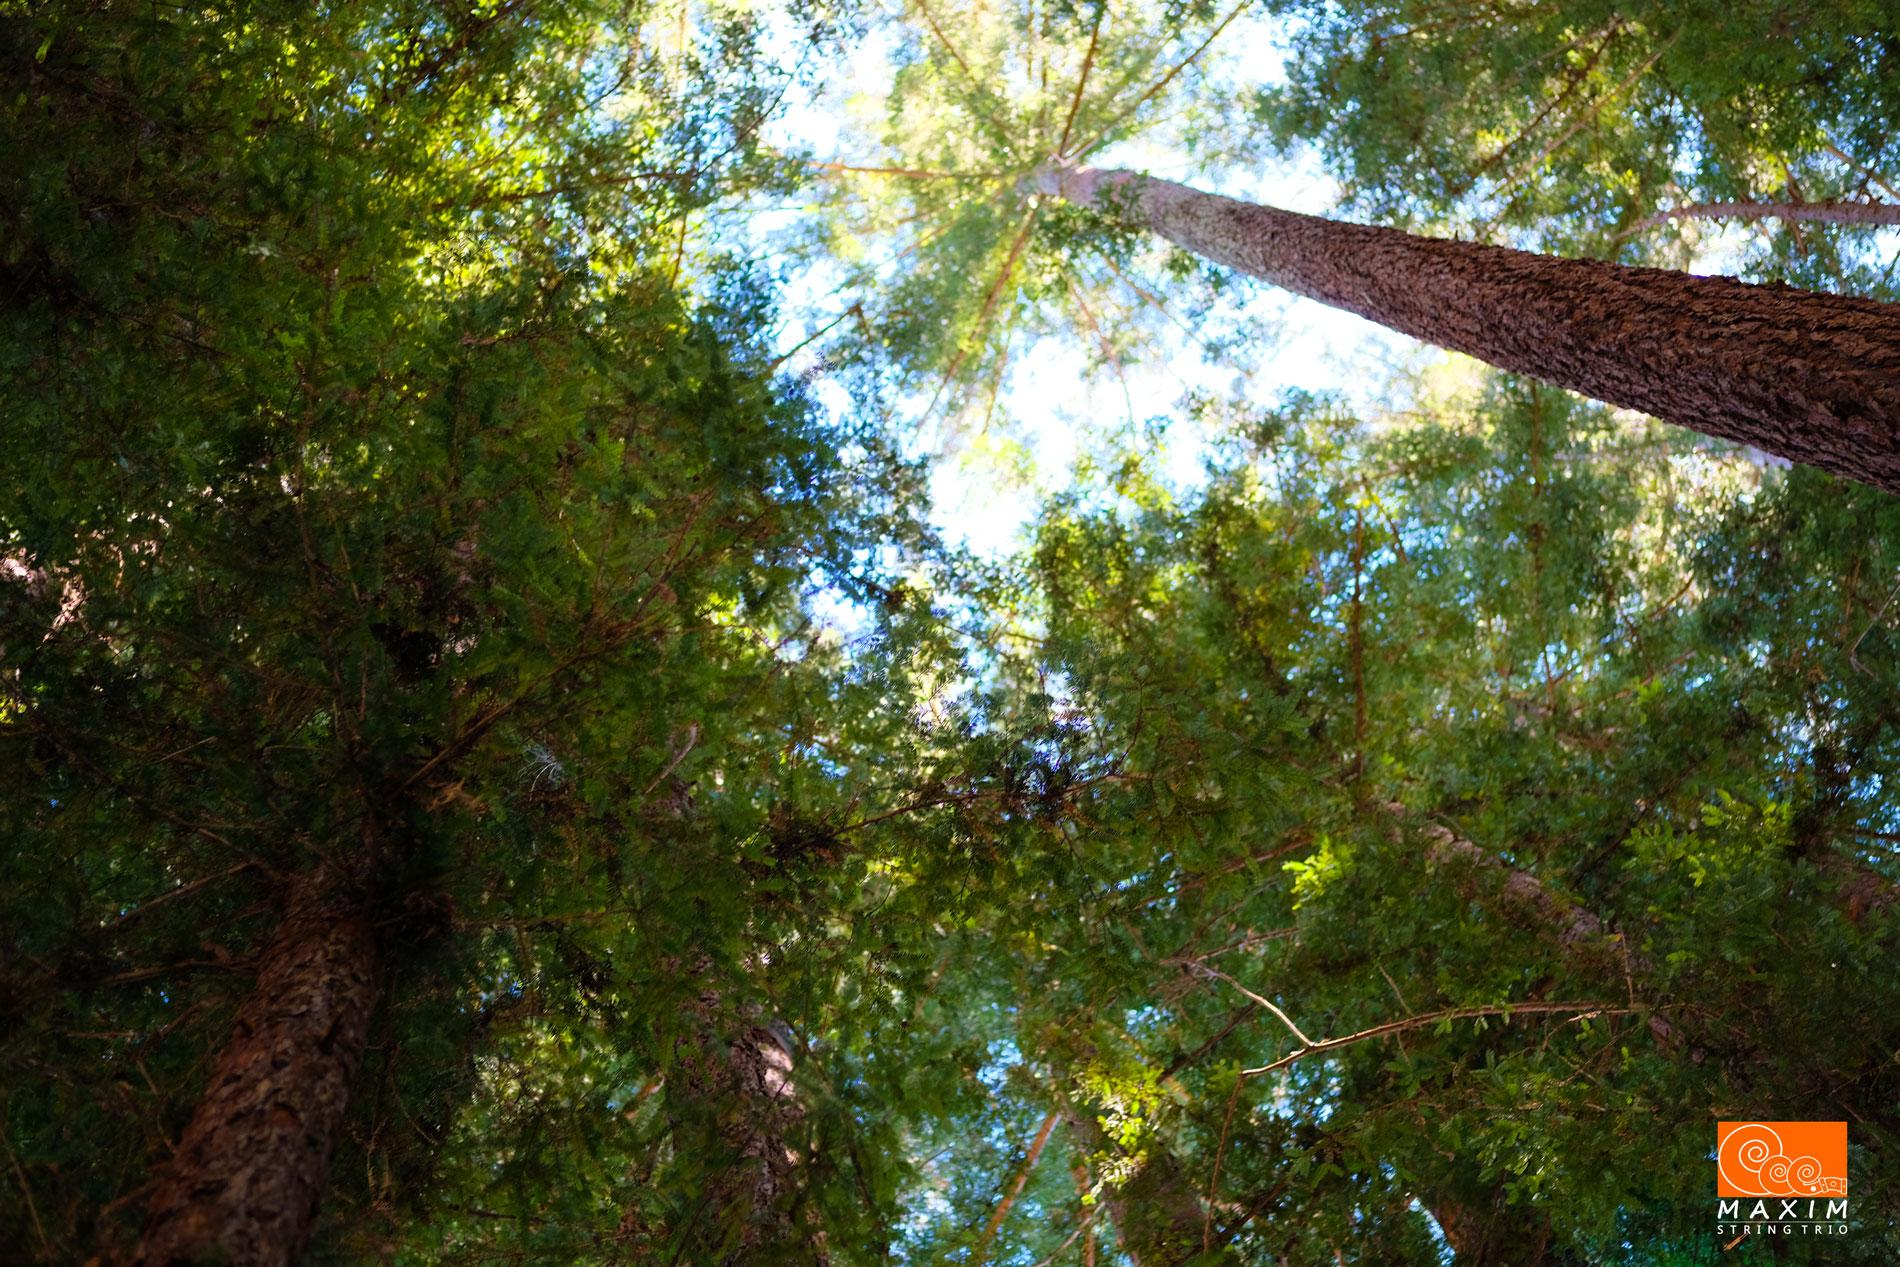 The Redwood Trees